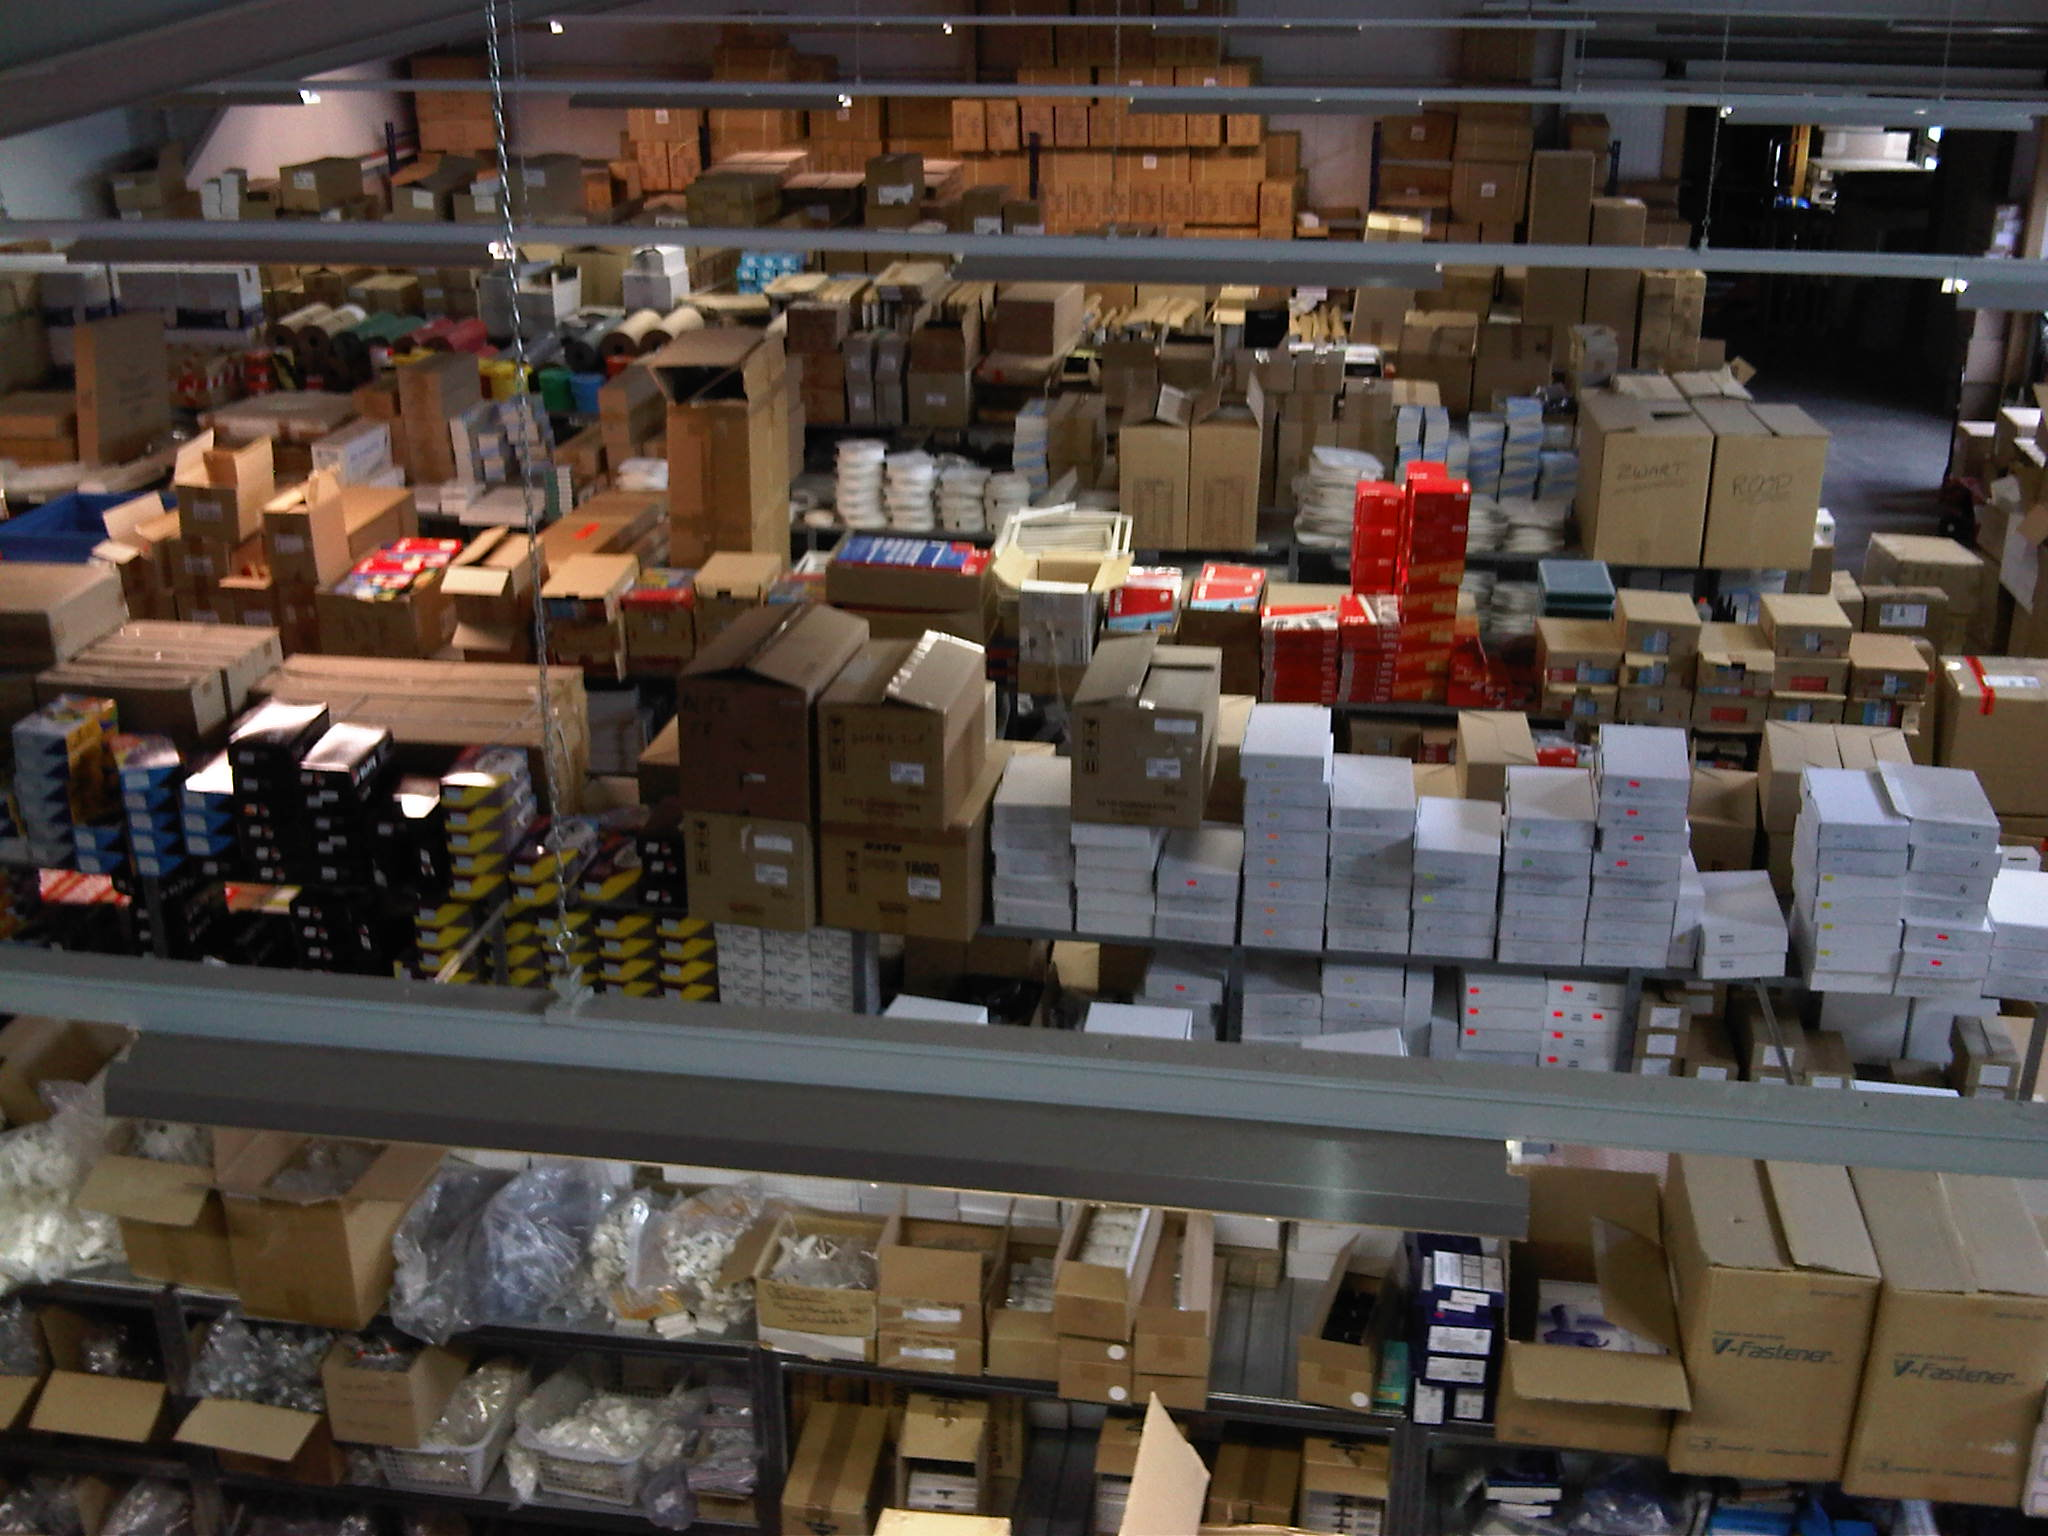 magazijn van bovenaf